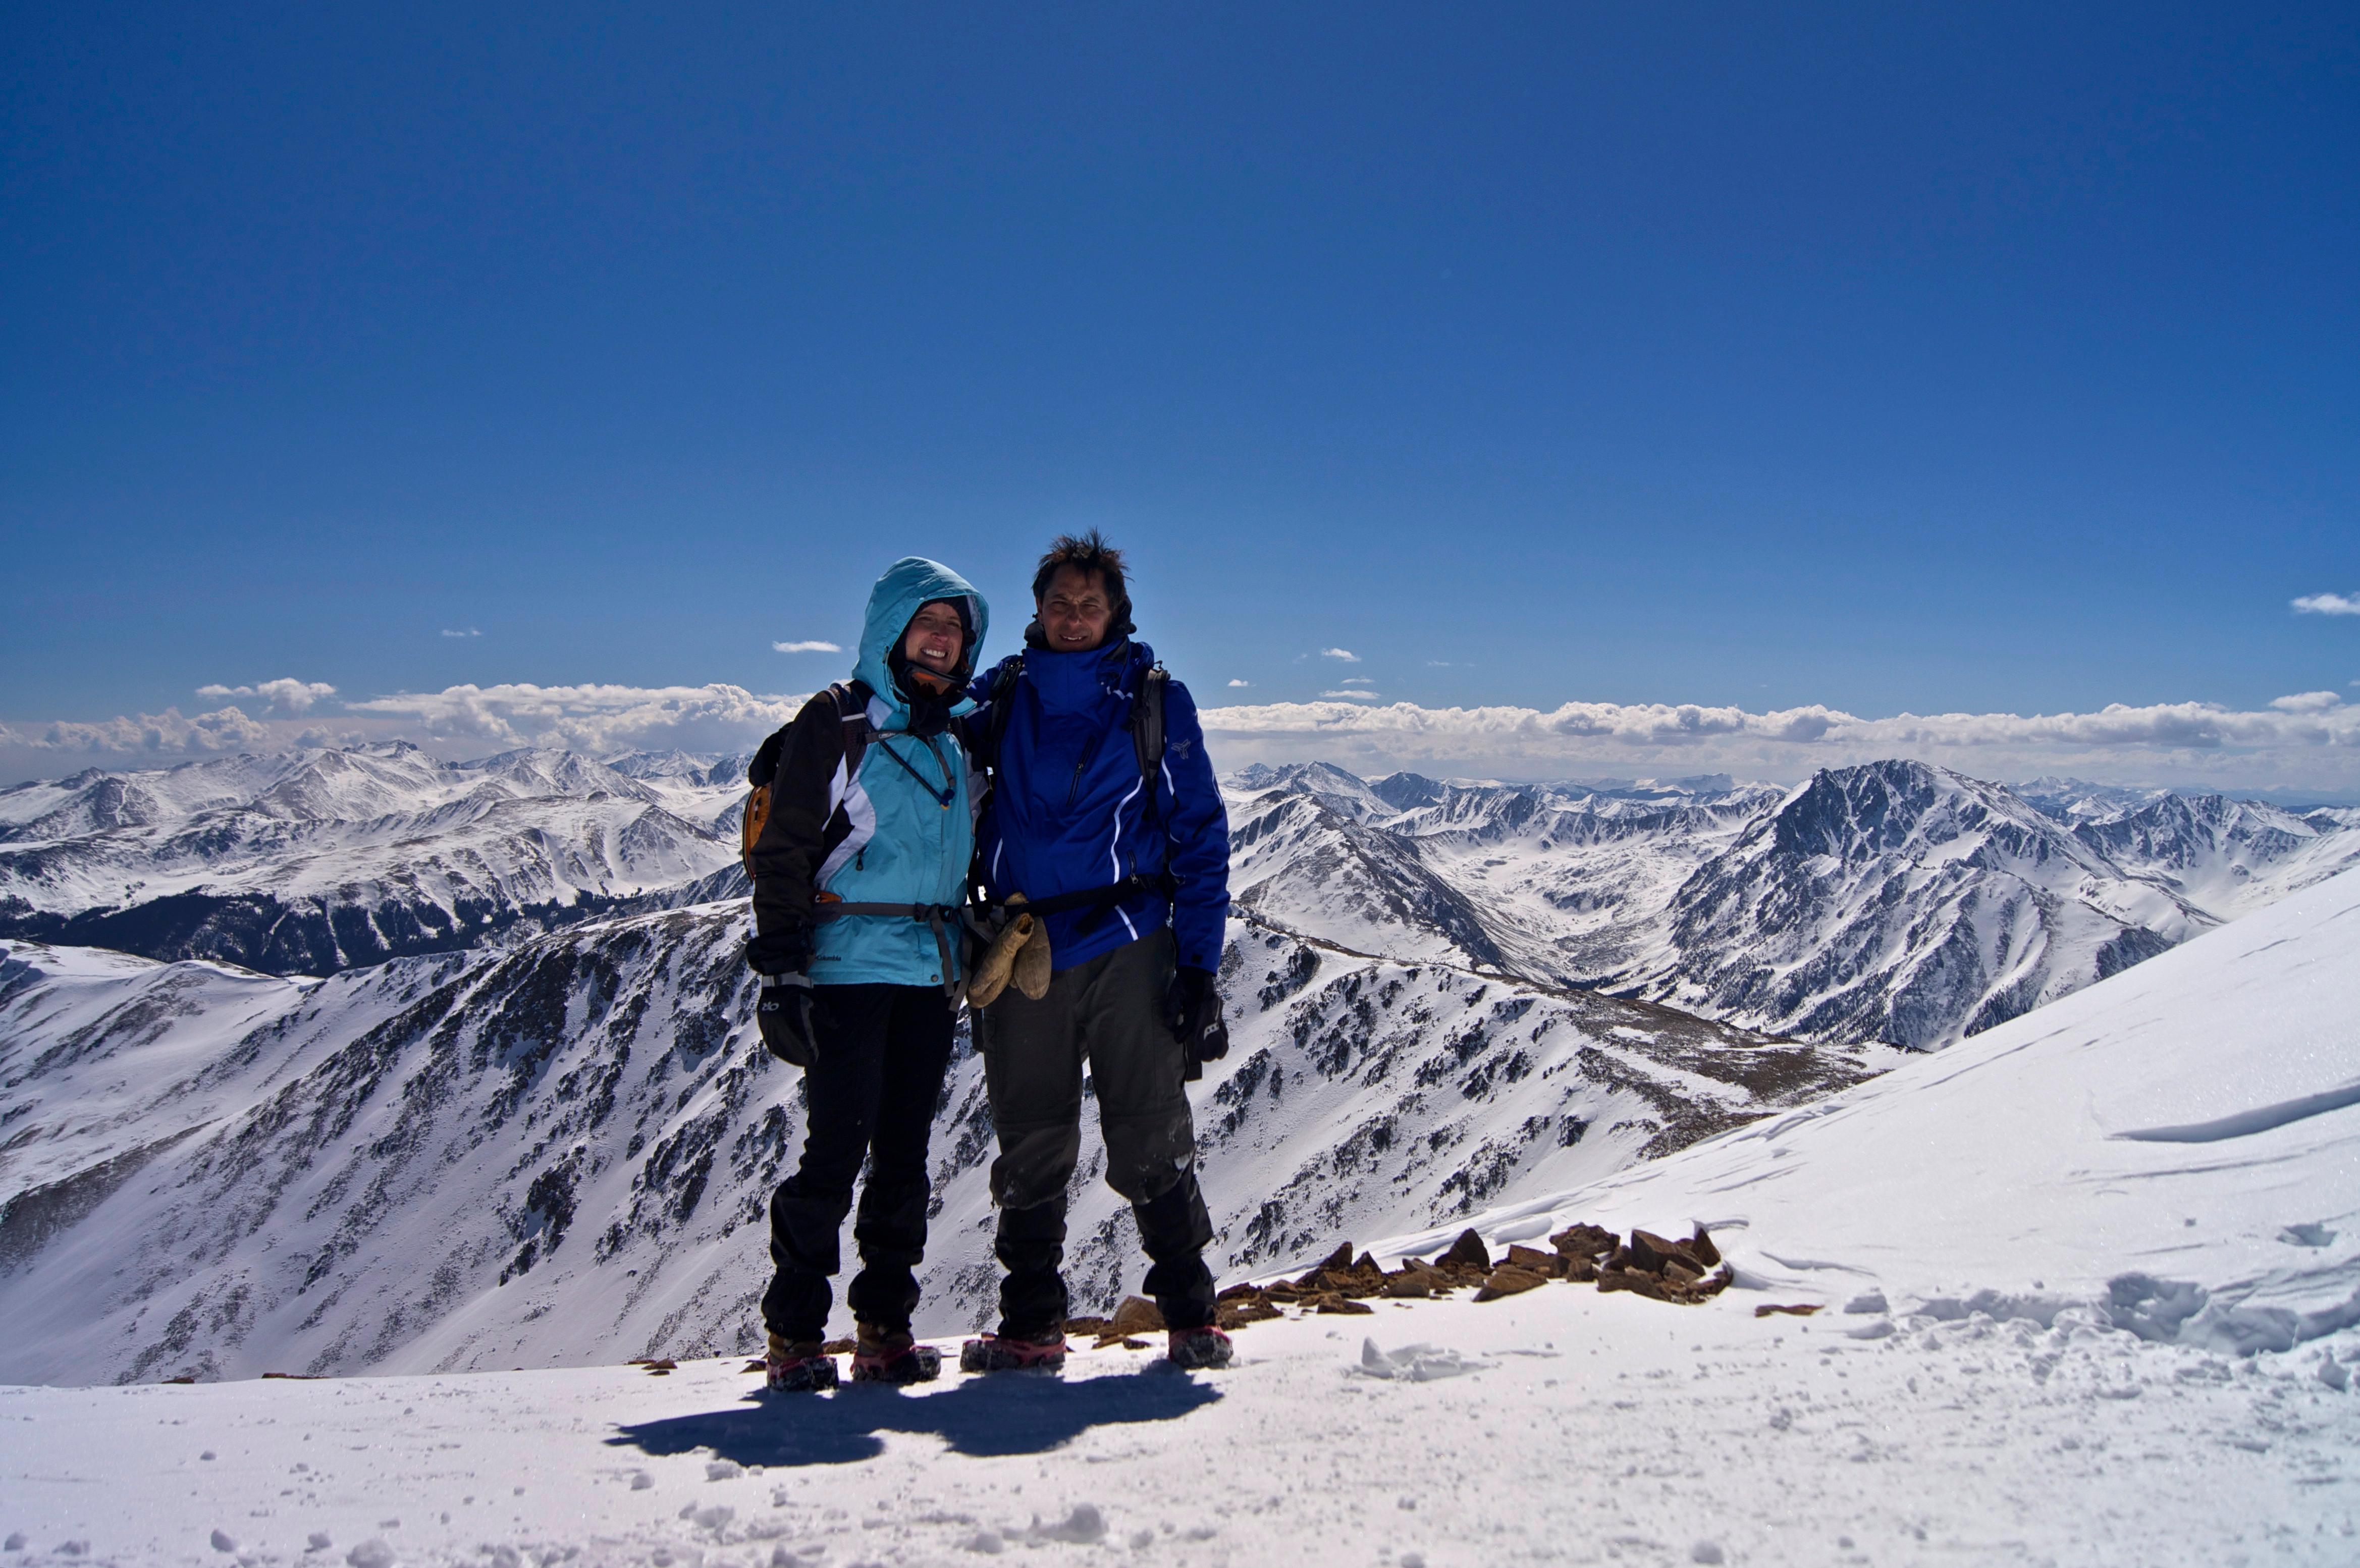 mountain climbing gives spokane couple unique form of marriage